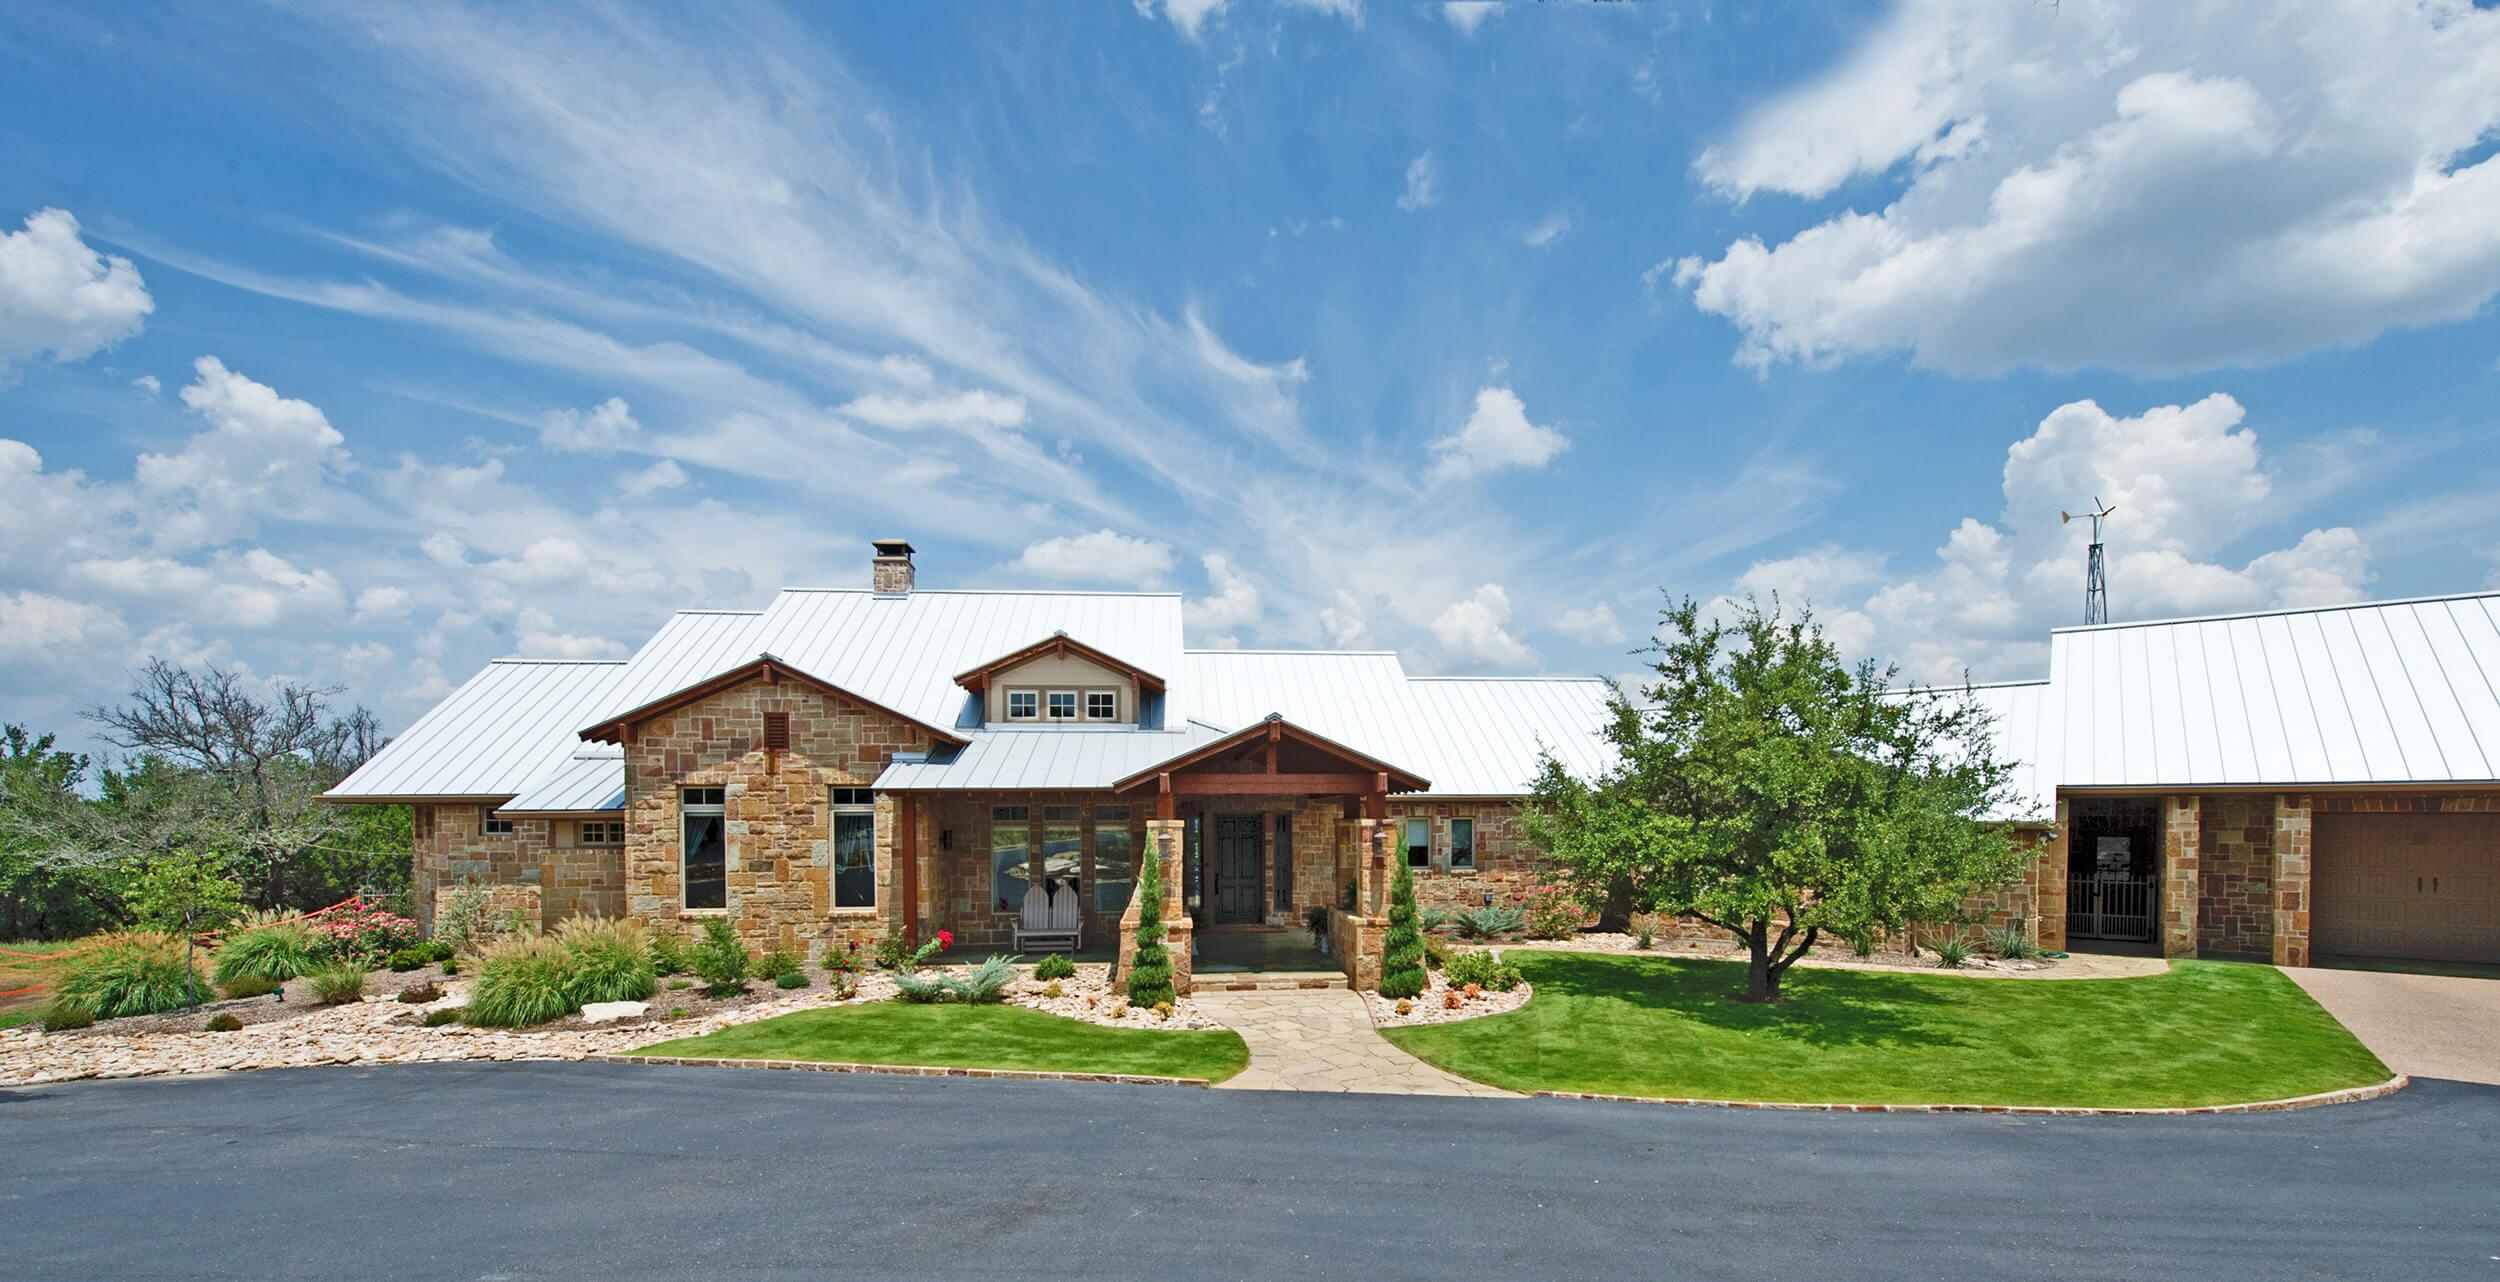 Steve Bumpas Custom Homes Ridgeview 02 Homebuilder Remodel Granbury Brazos Bend Cresson DeCordova Pecan Plantation Tolar Glen Rose Fort Worth.jpg